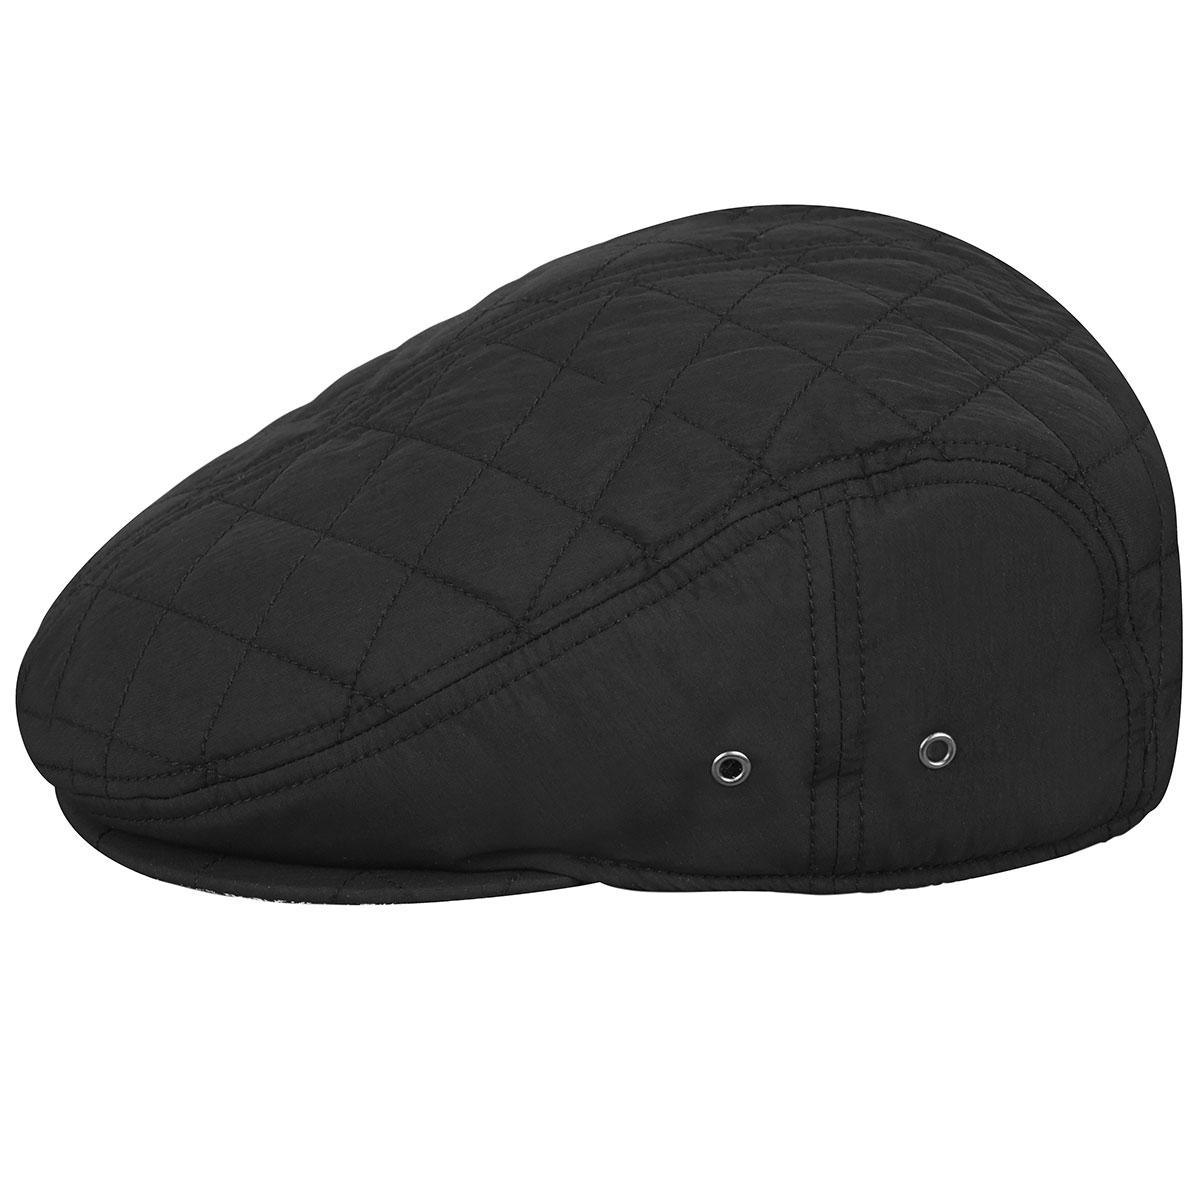 Kangol Hidden Layers Driving Cap in Black